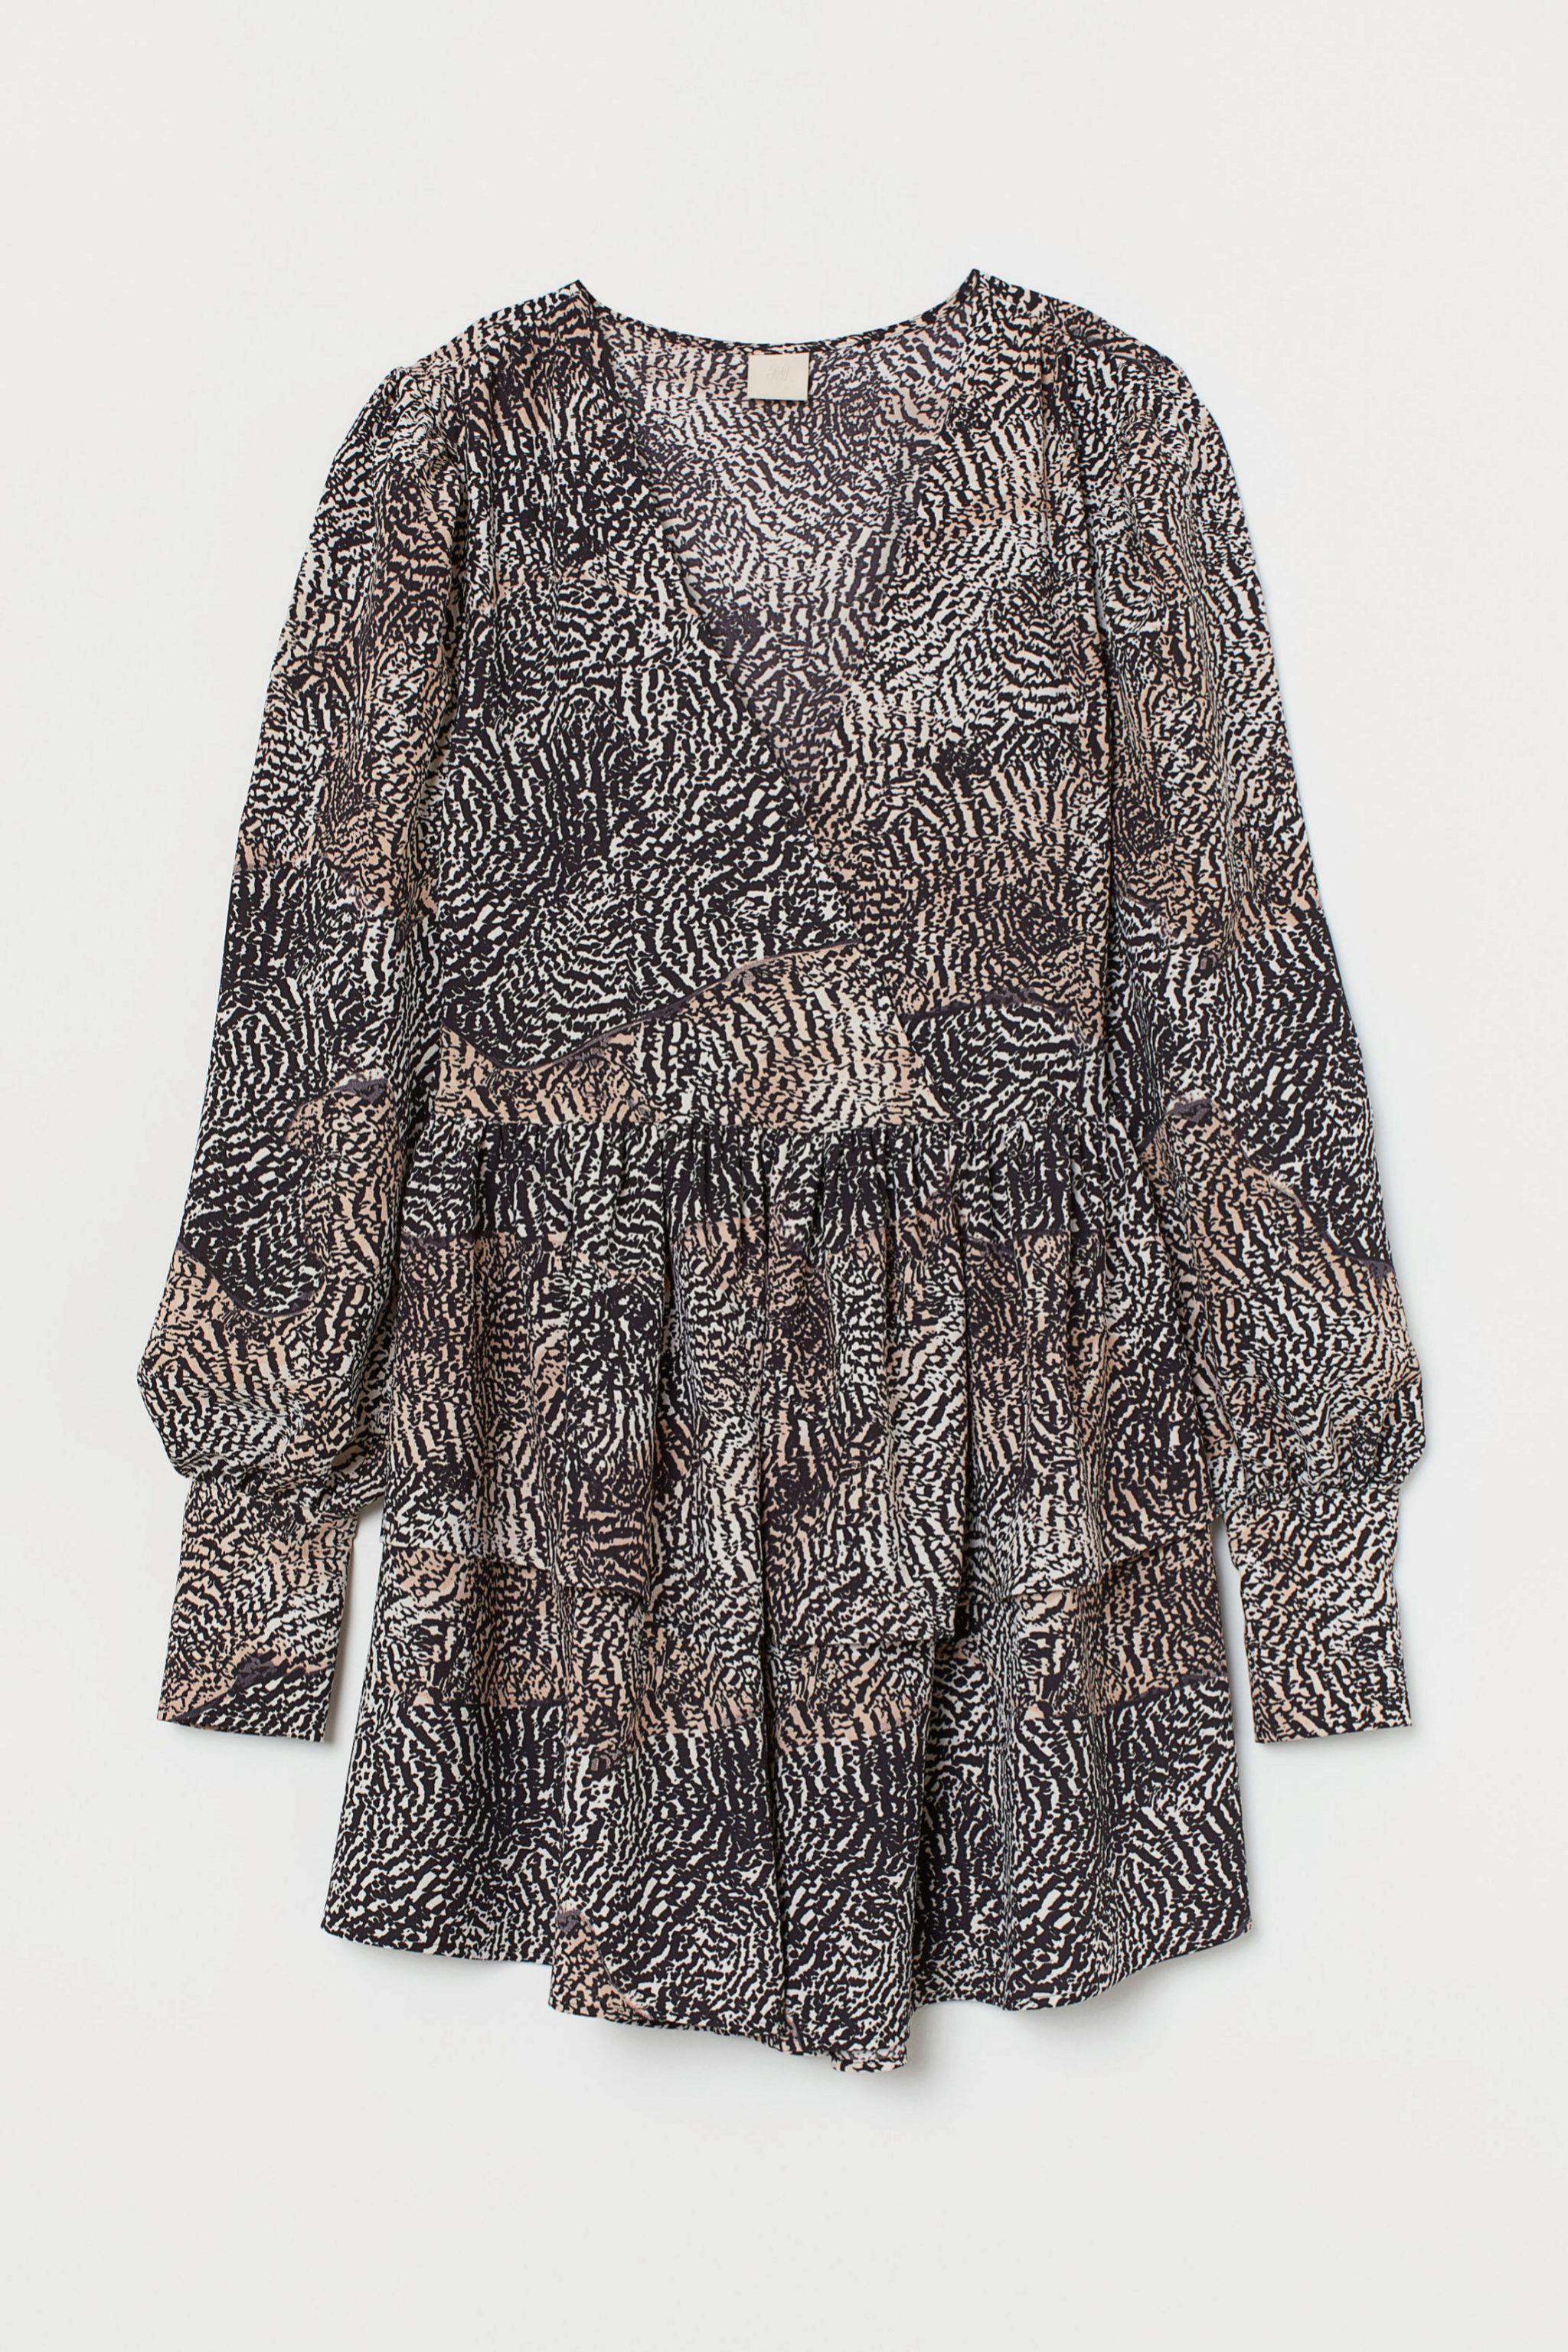 Vestido con mangas abullonadas de animal print de H&M